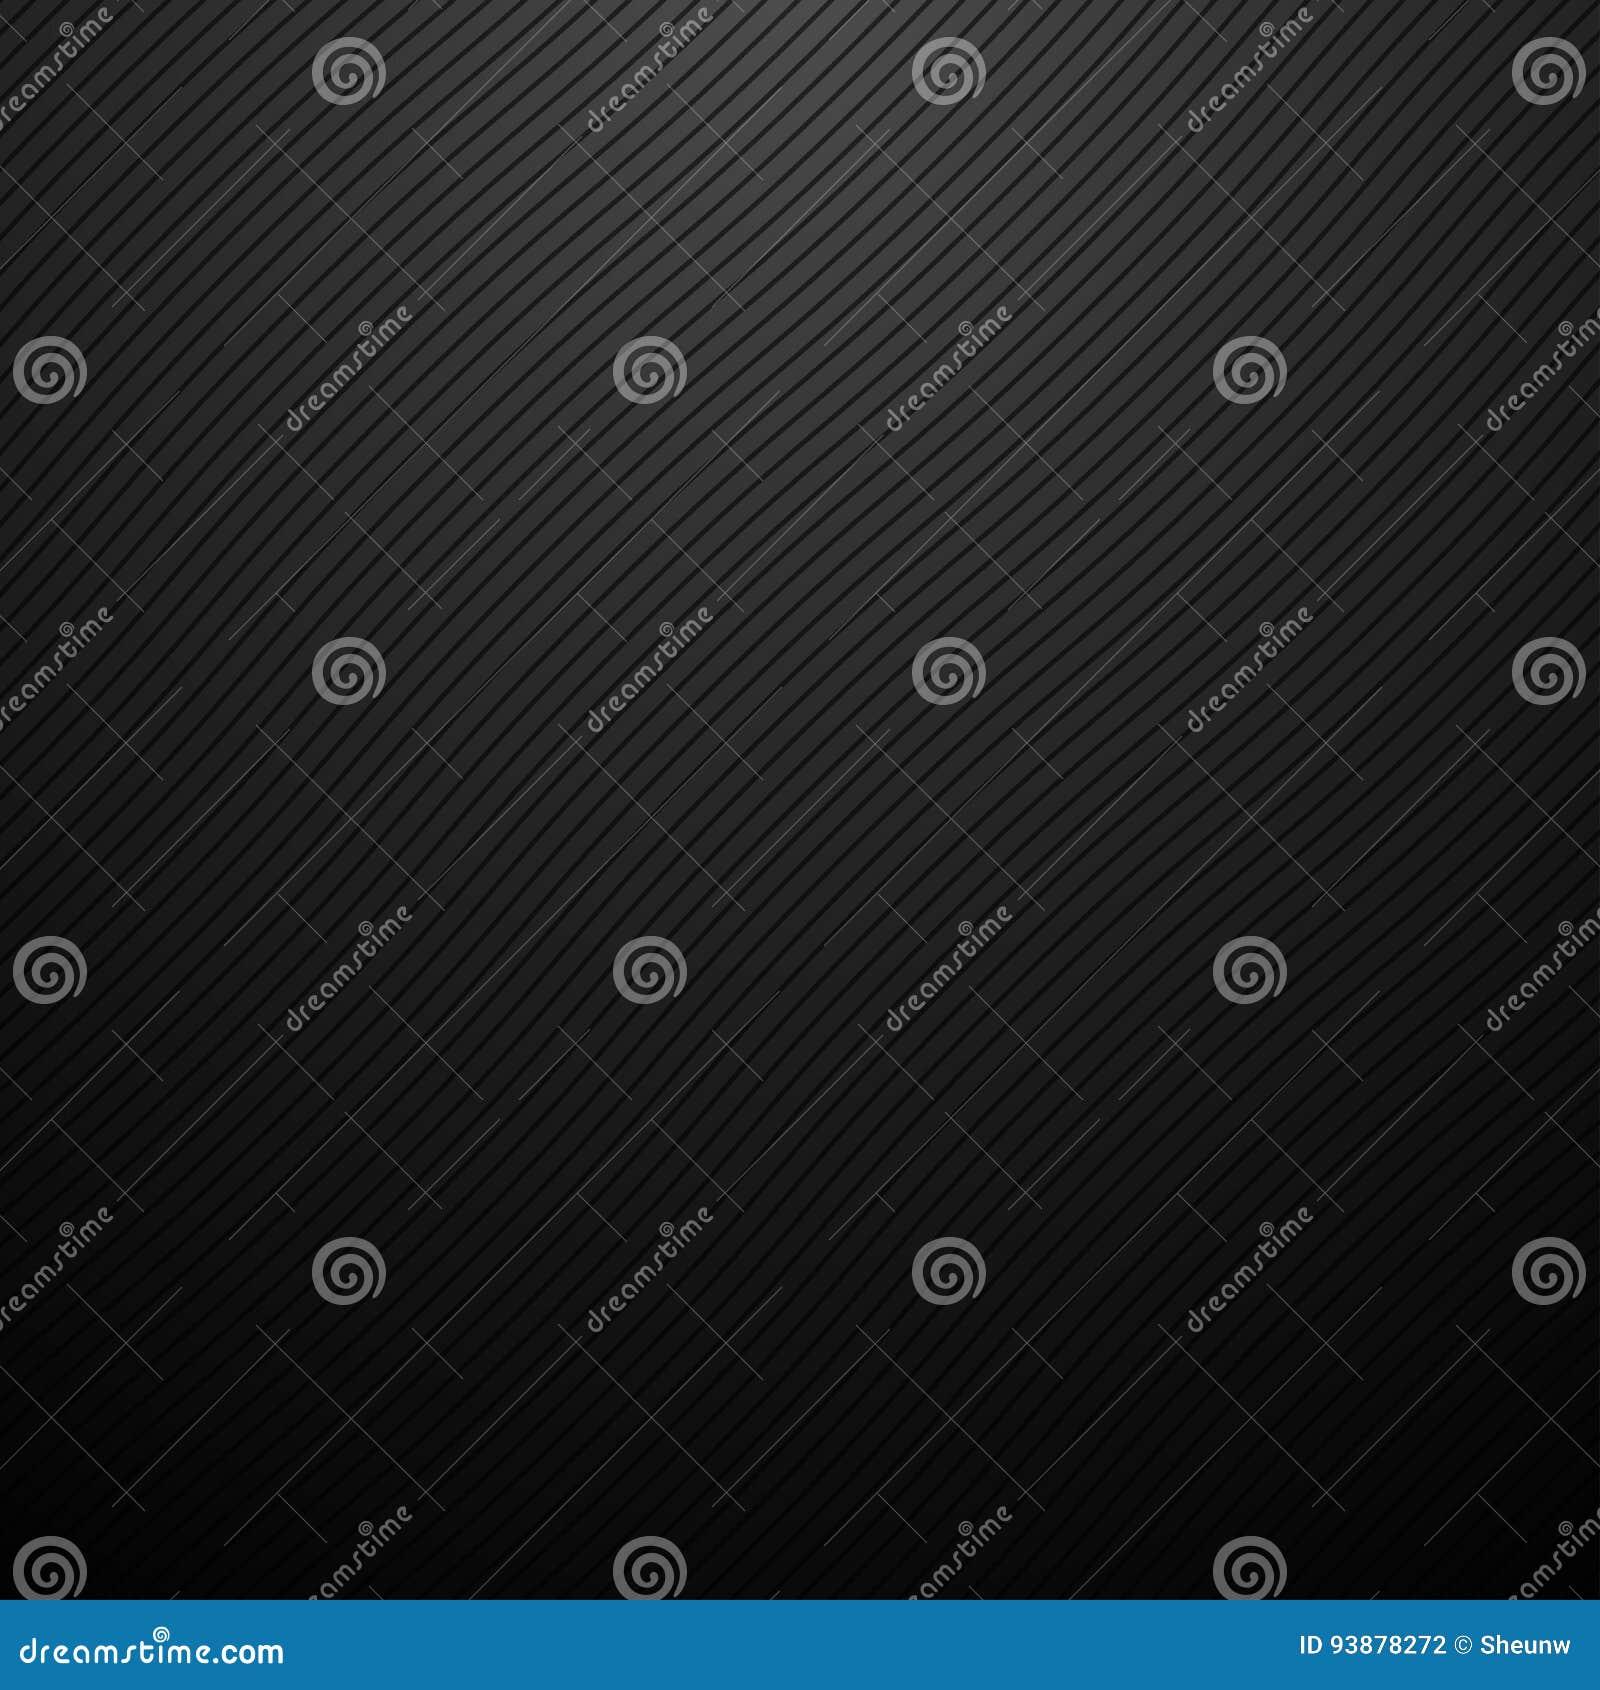 Dark vector abstract background. Wavy diagonal lines. Carbon texture.